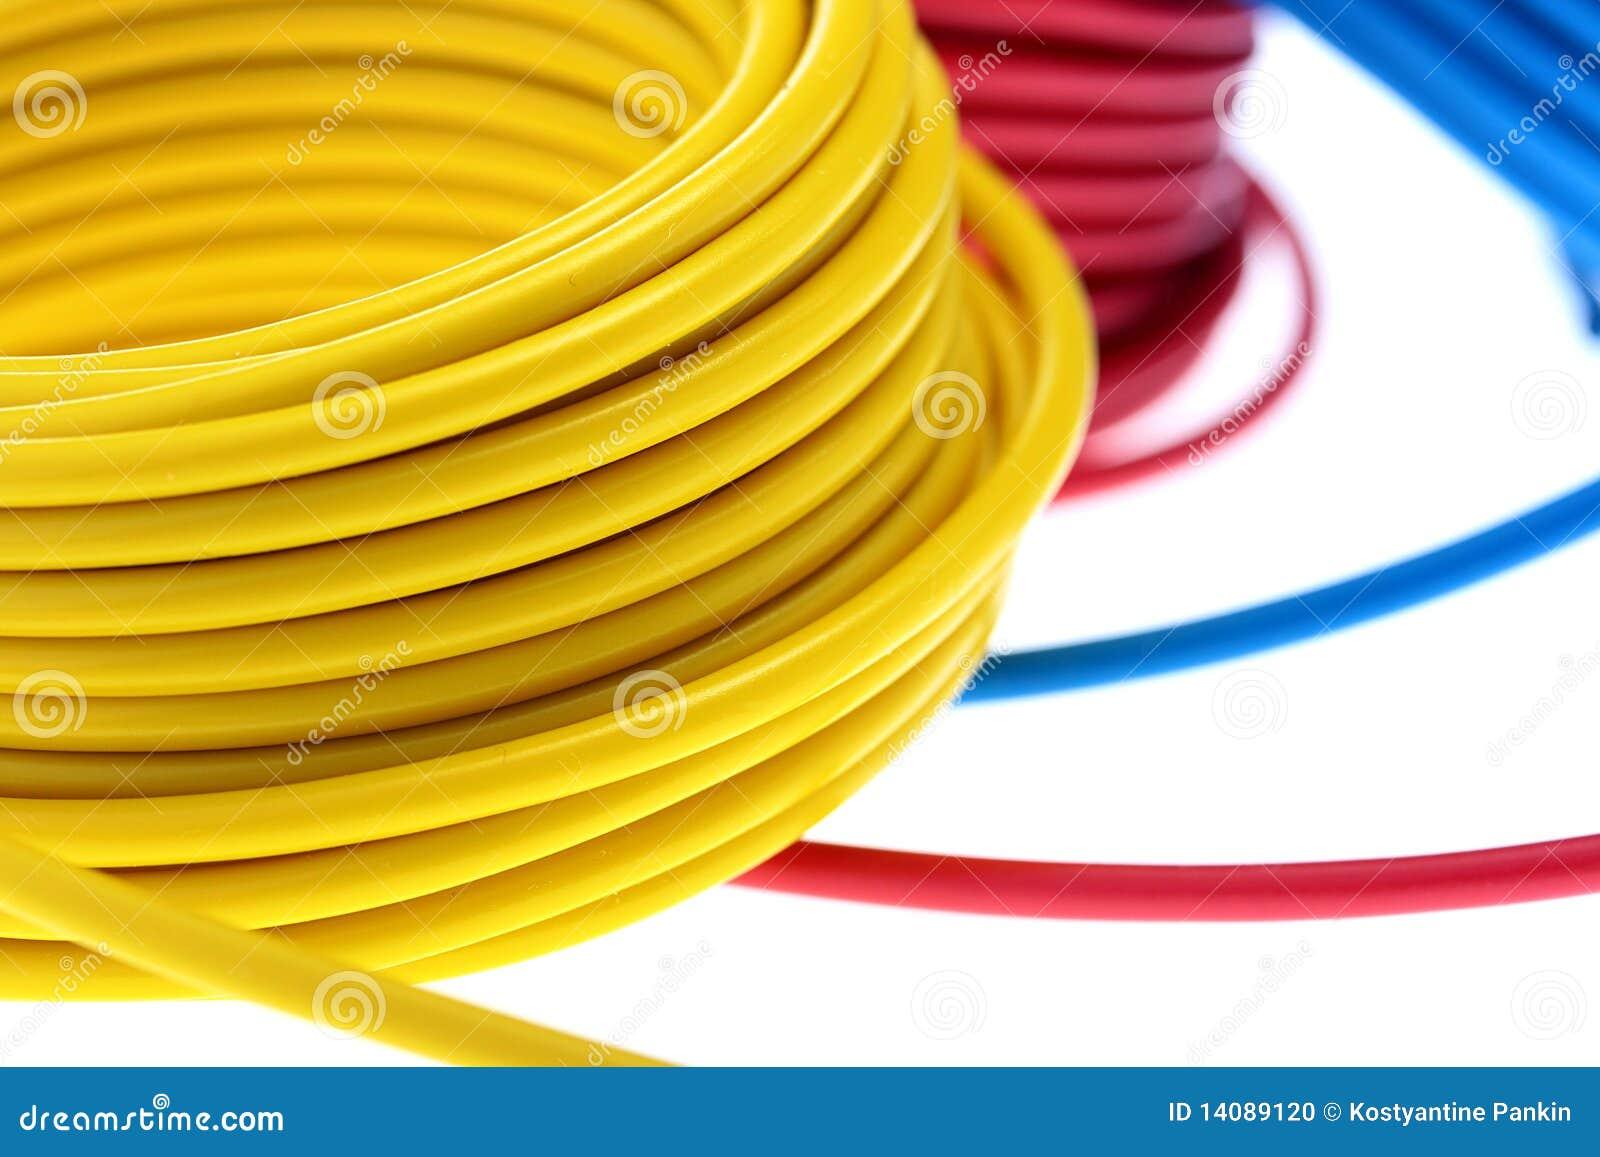 Wunderbar Gelbe Drahtmuttern Fotos - Schaltplan Serie Circuit ...